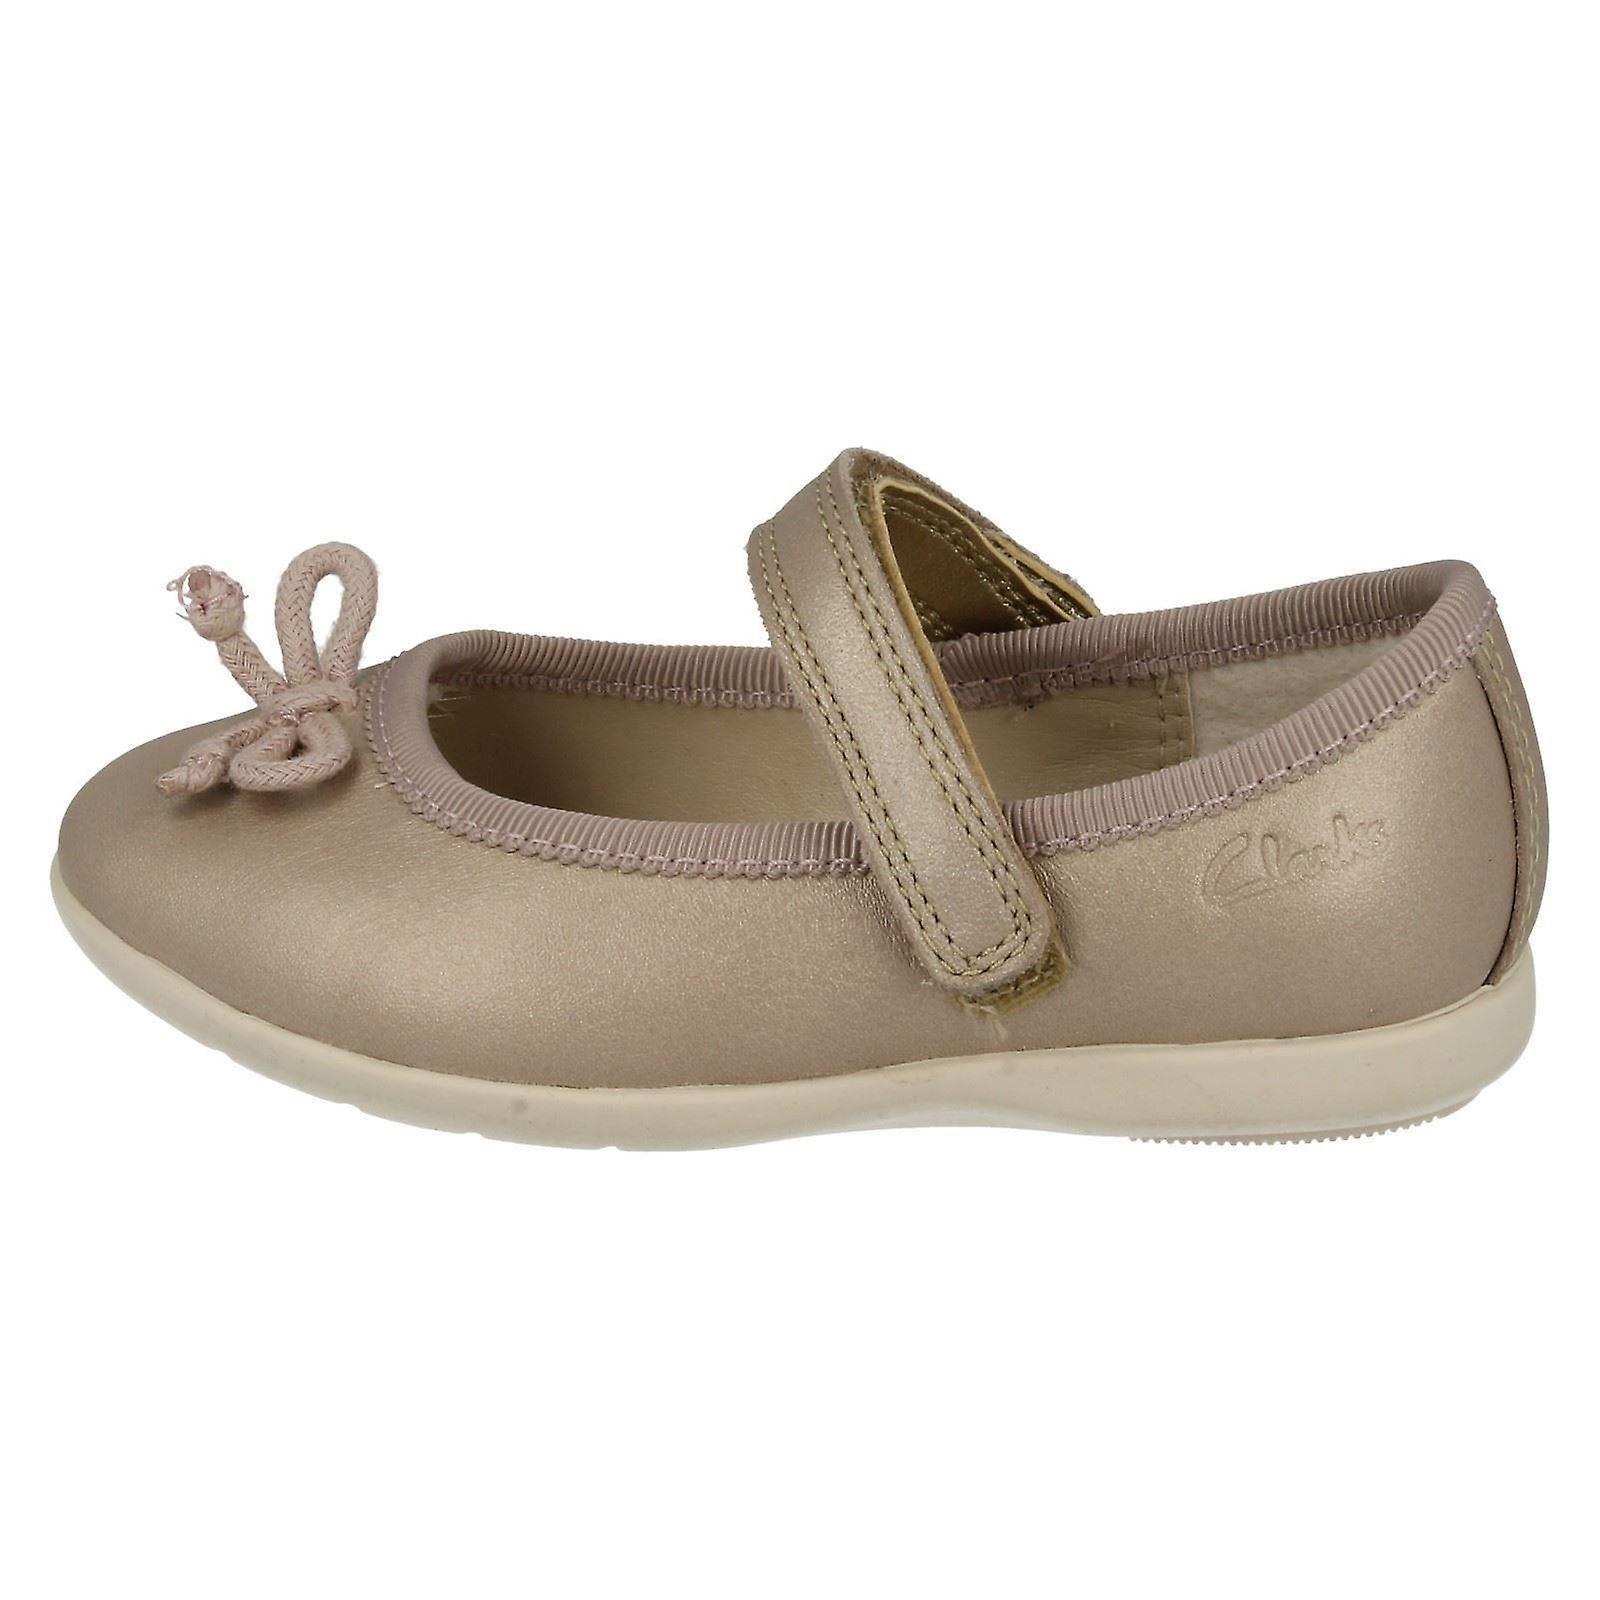 Clarks Girls Shoes Dance Joy